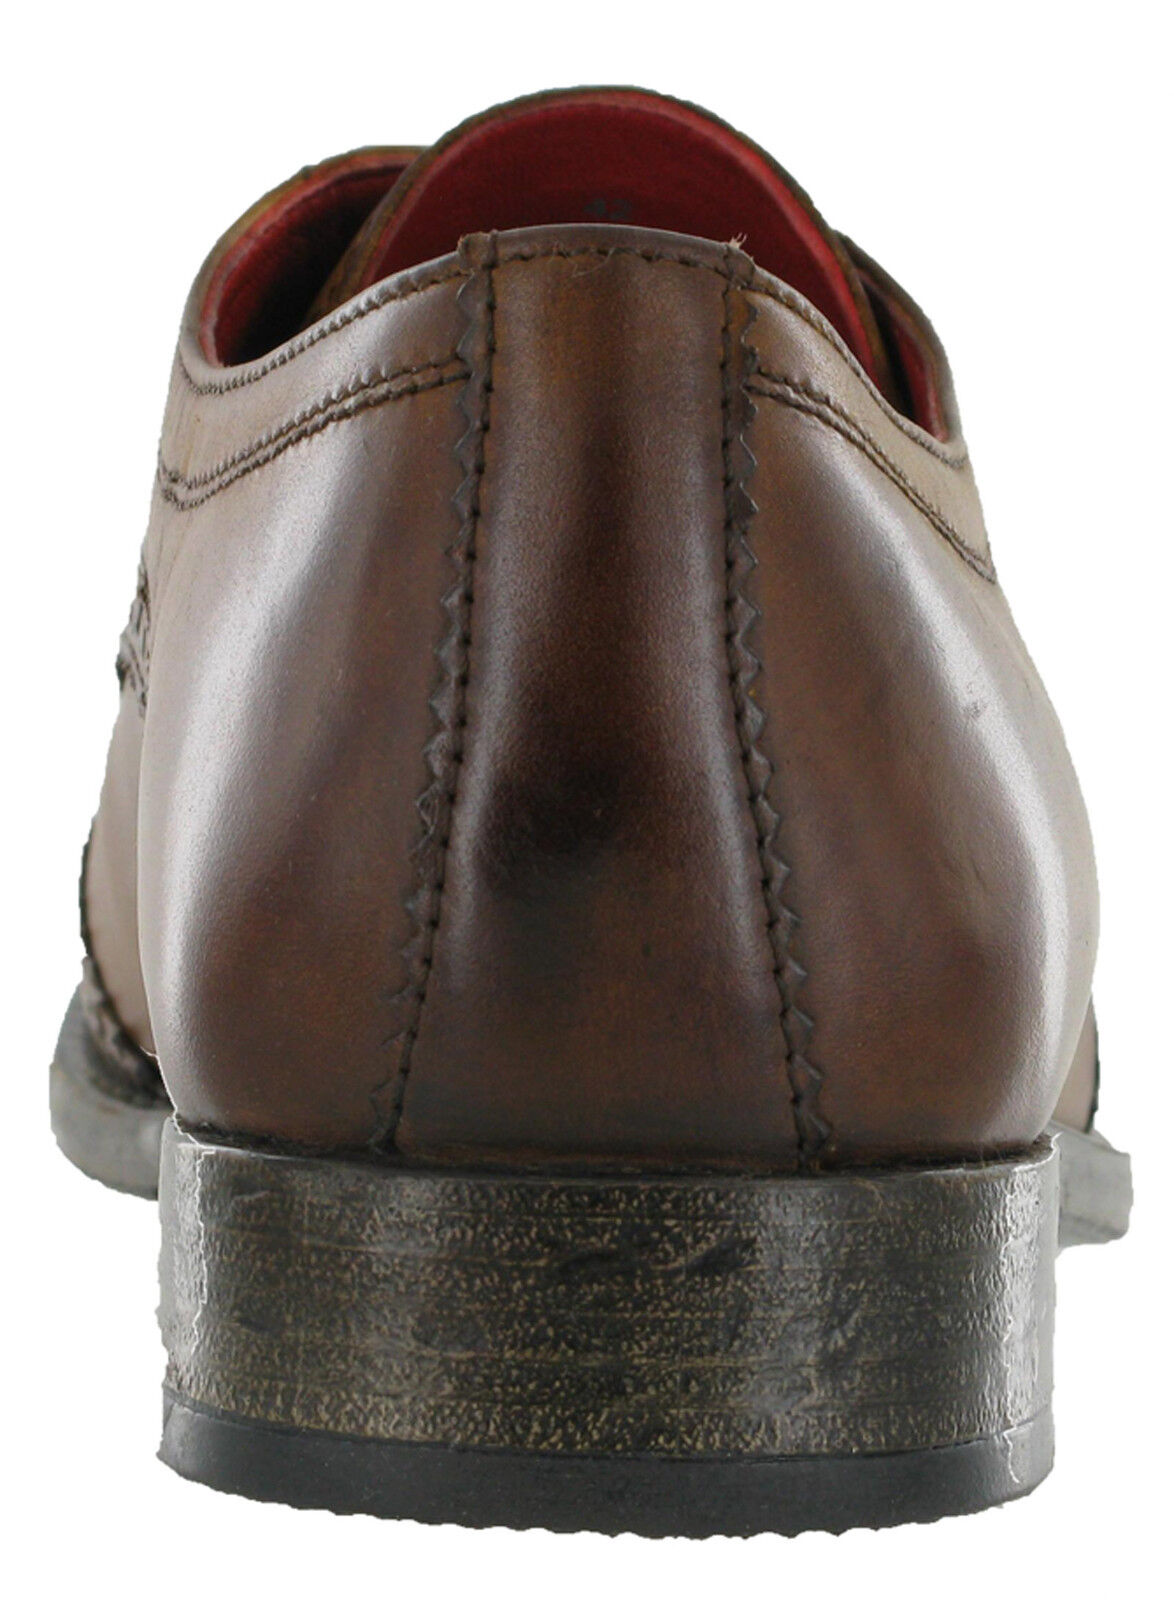 Tan Tan Tan Brogue Schuhes Base London Leder Coniston 5 Eye  Herren Formal Lined Lace Ups 148337